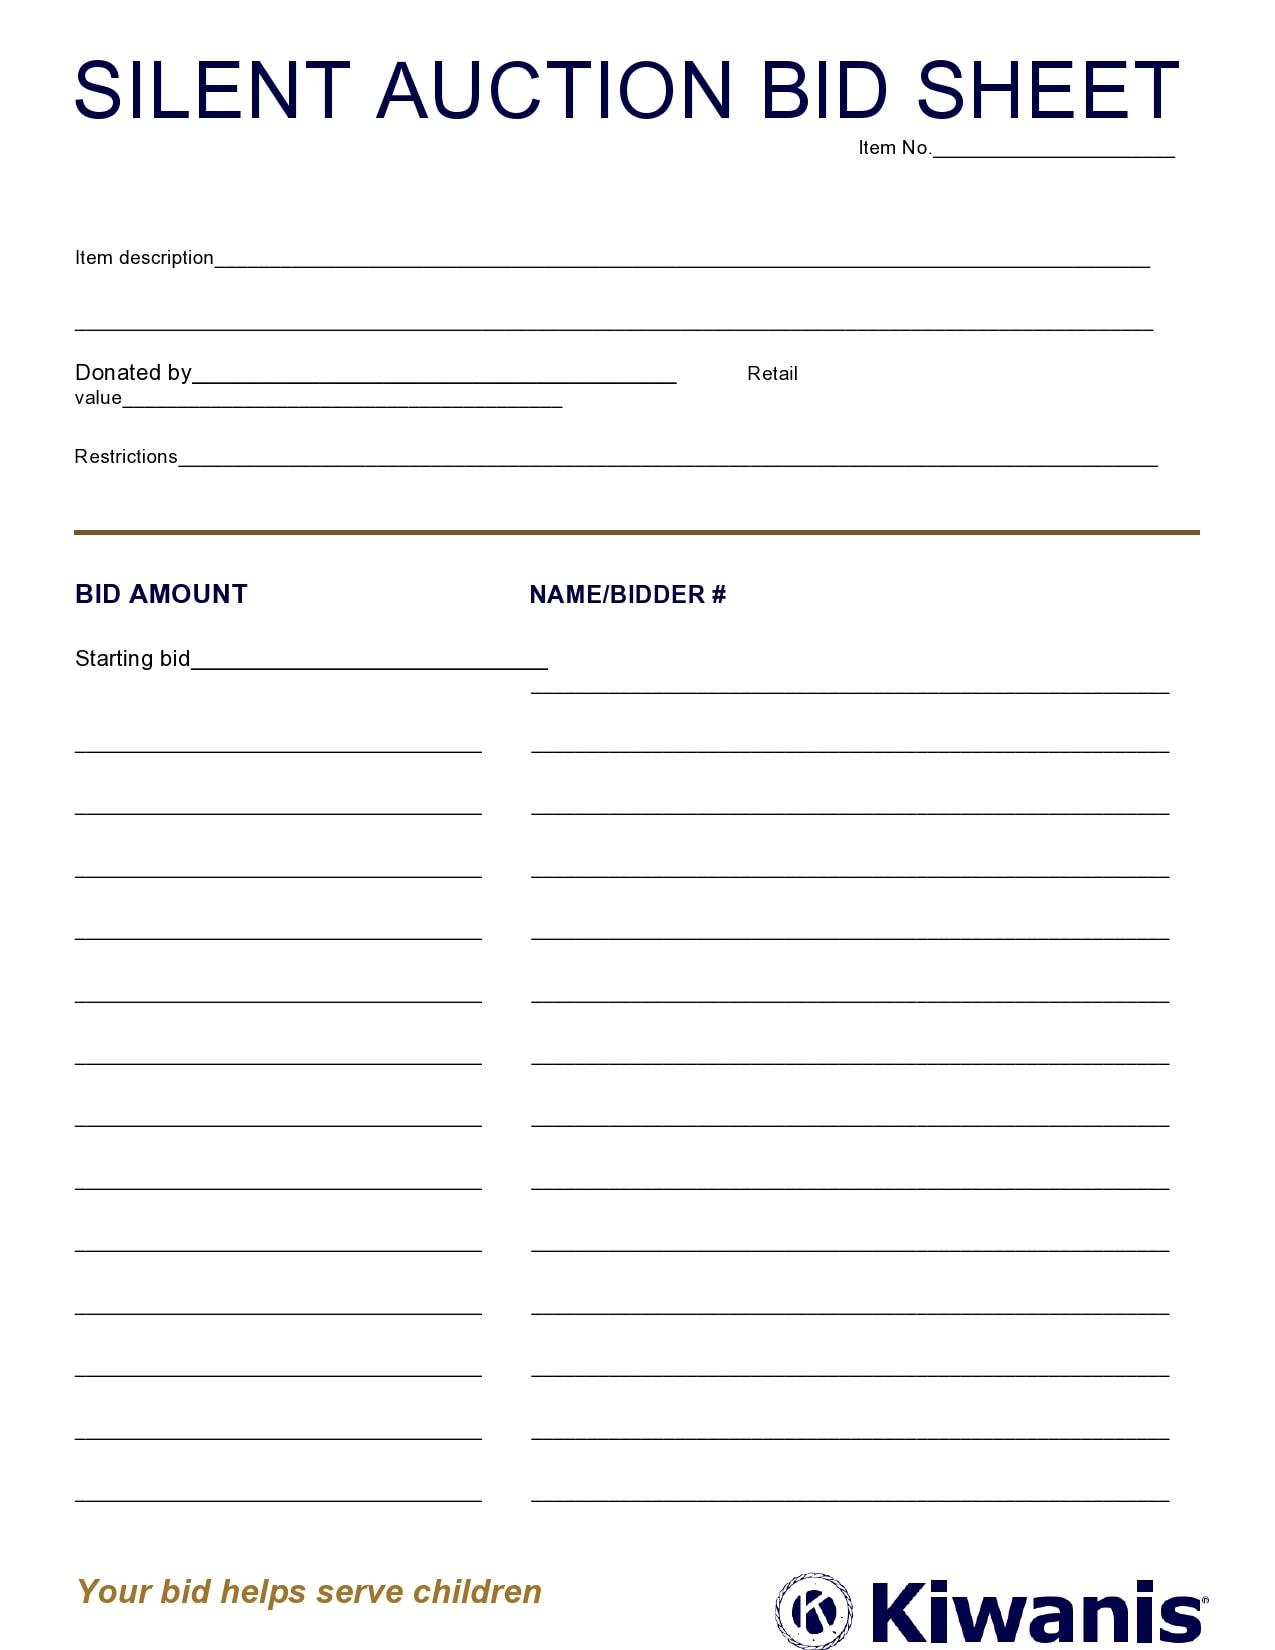 silent auction bid sheet 04